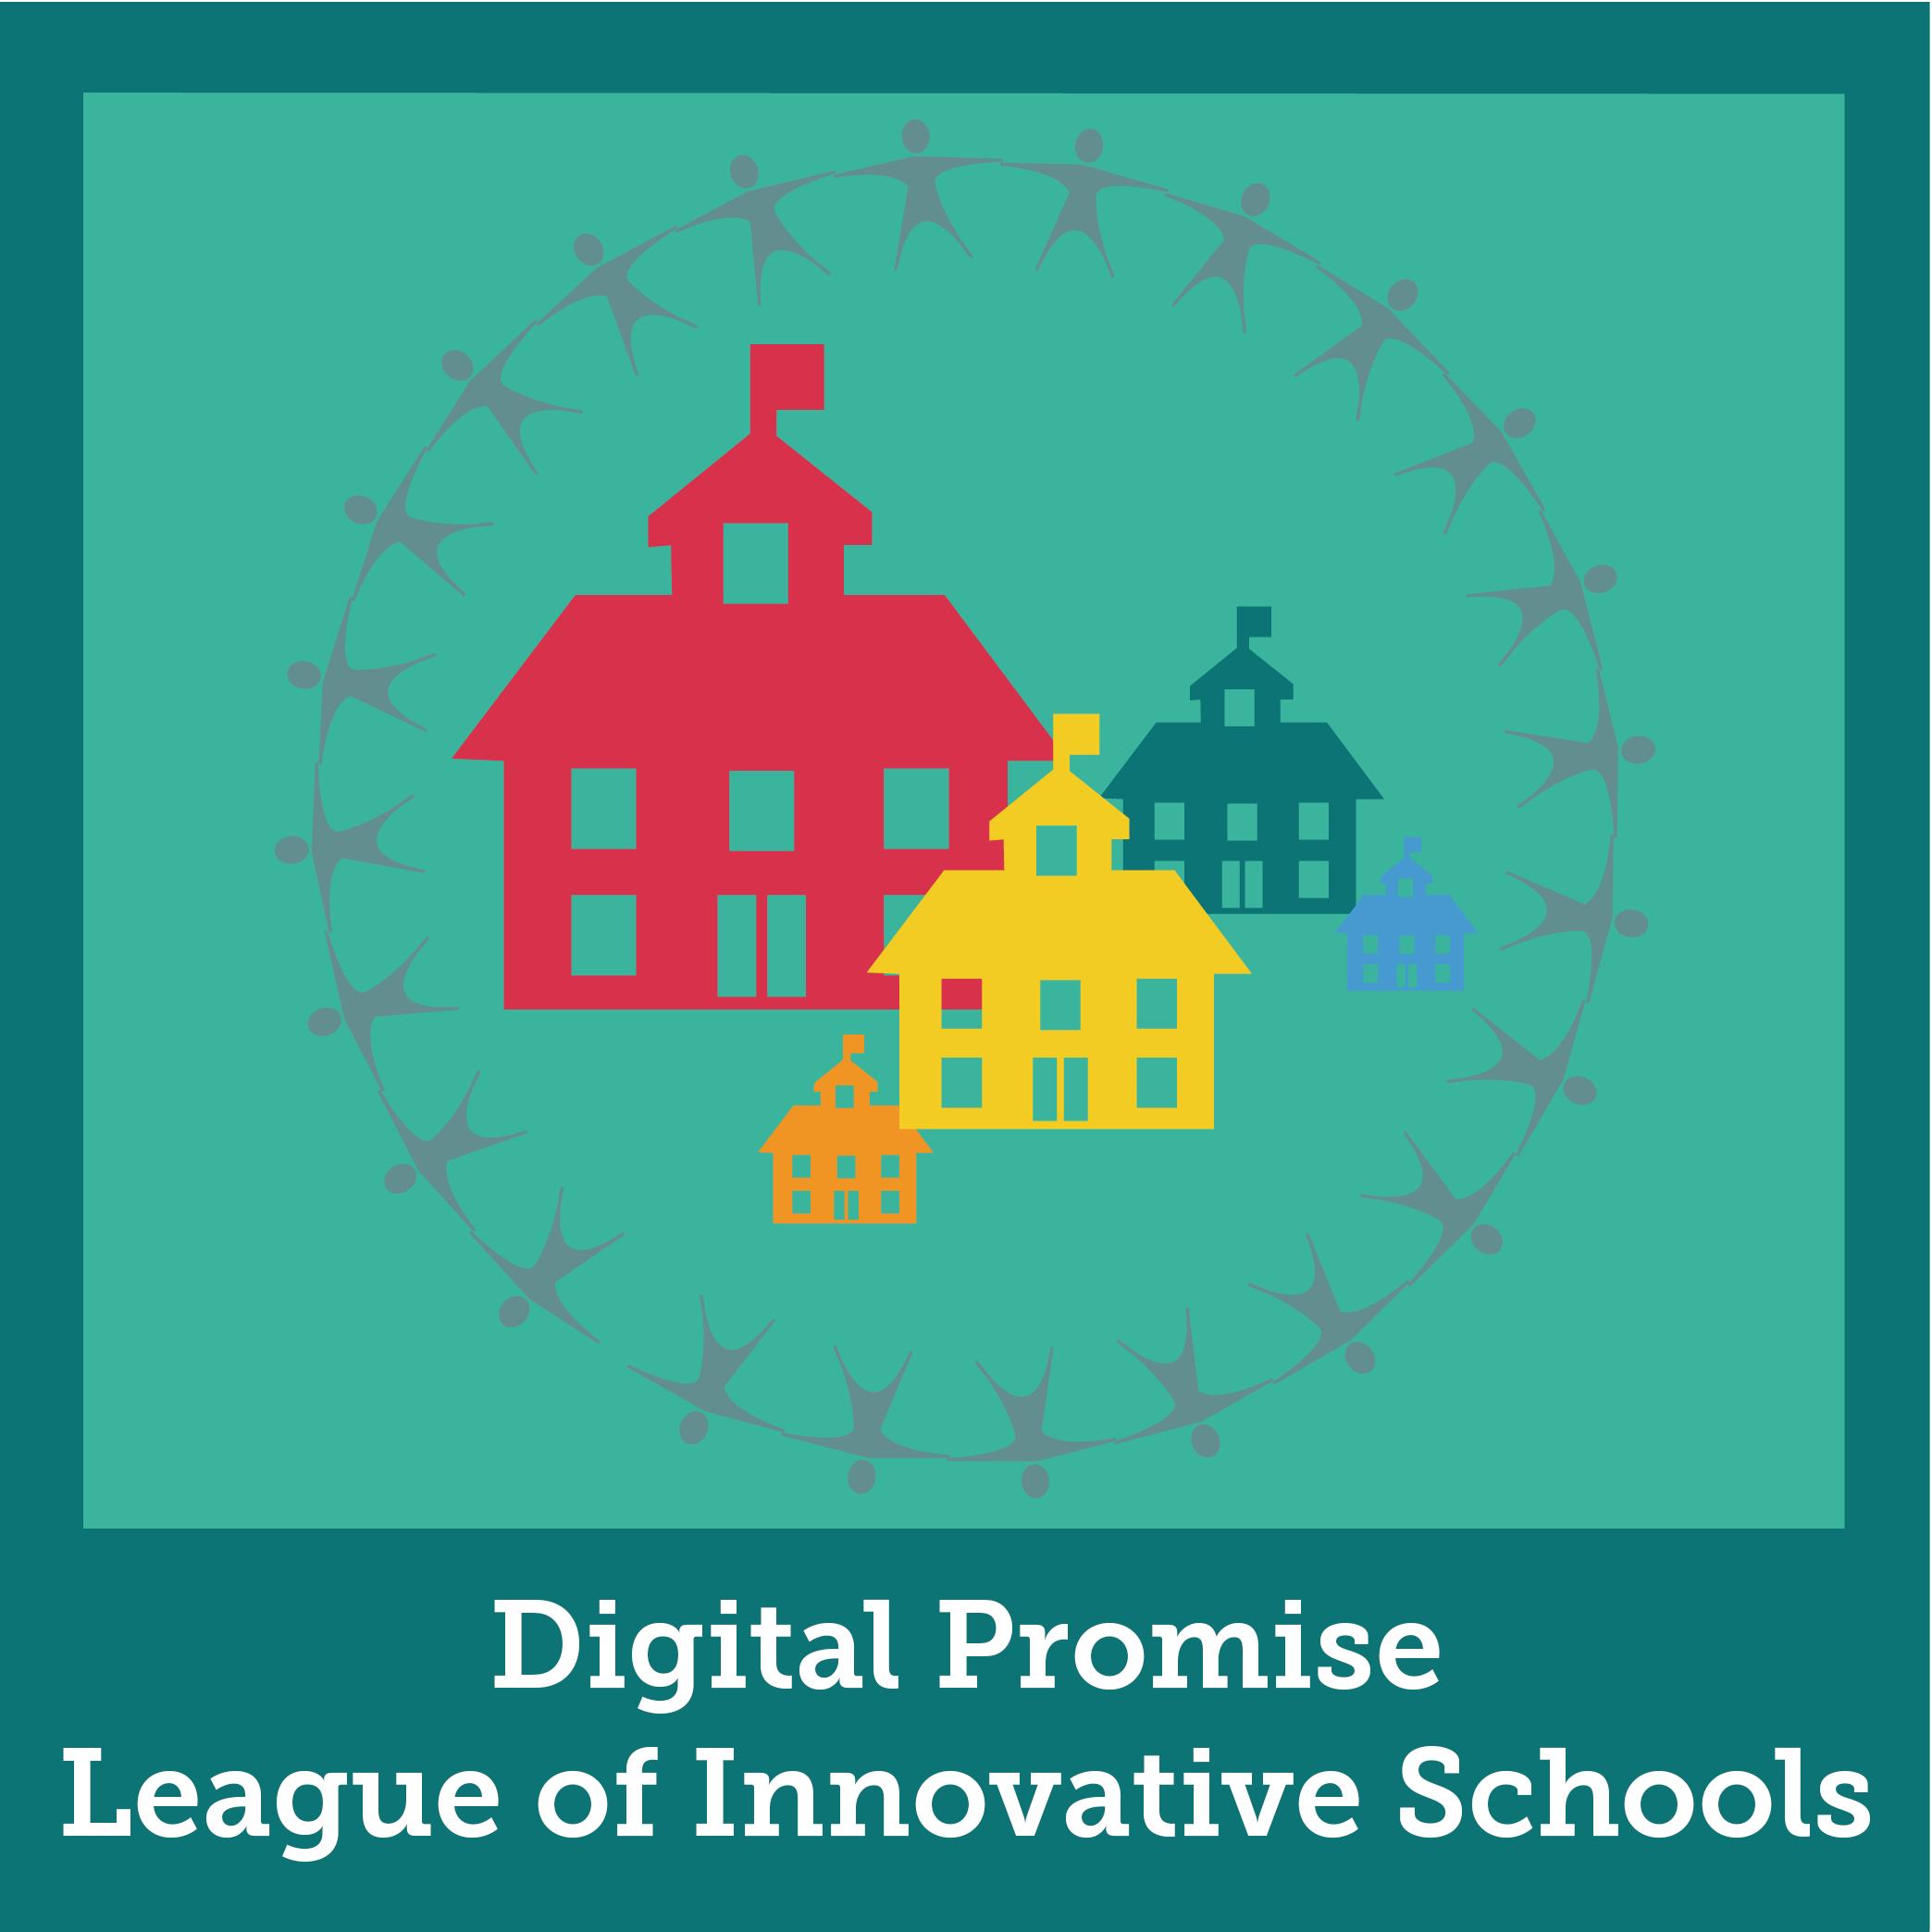 League of Innovative Schools